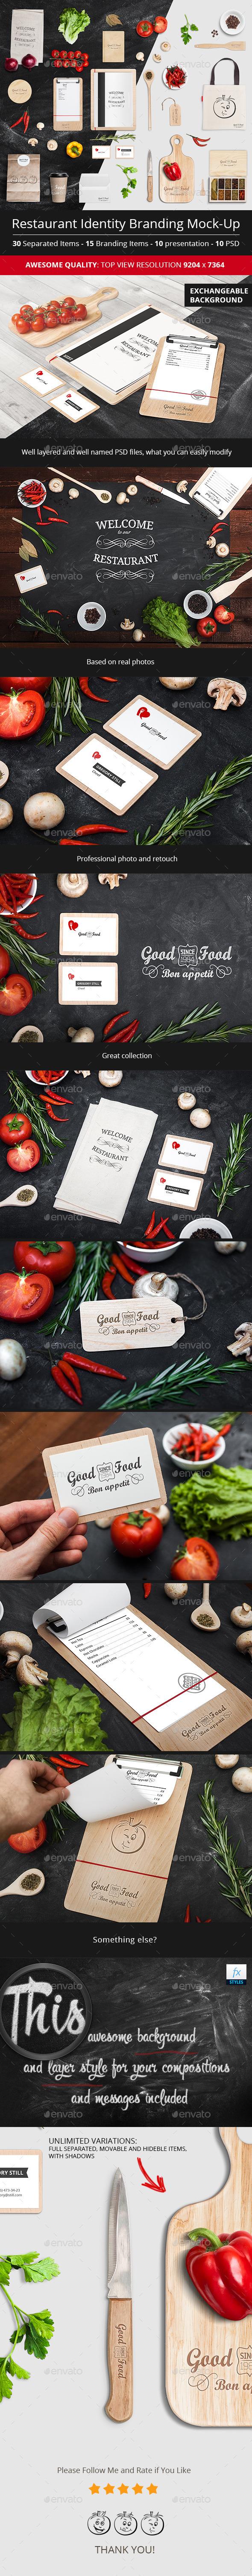 GraphicRiver Restaurant Identity Branding Mock-Up 11295222